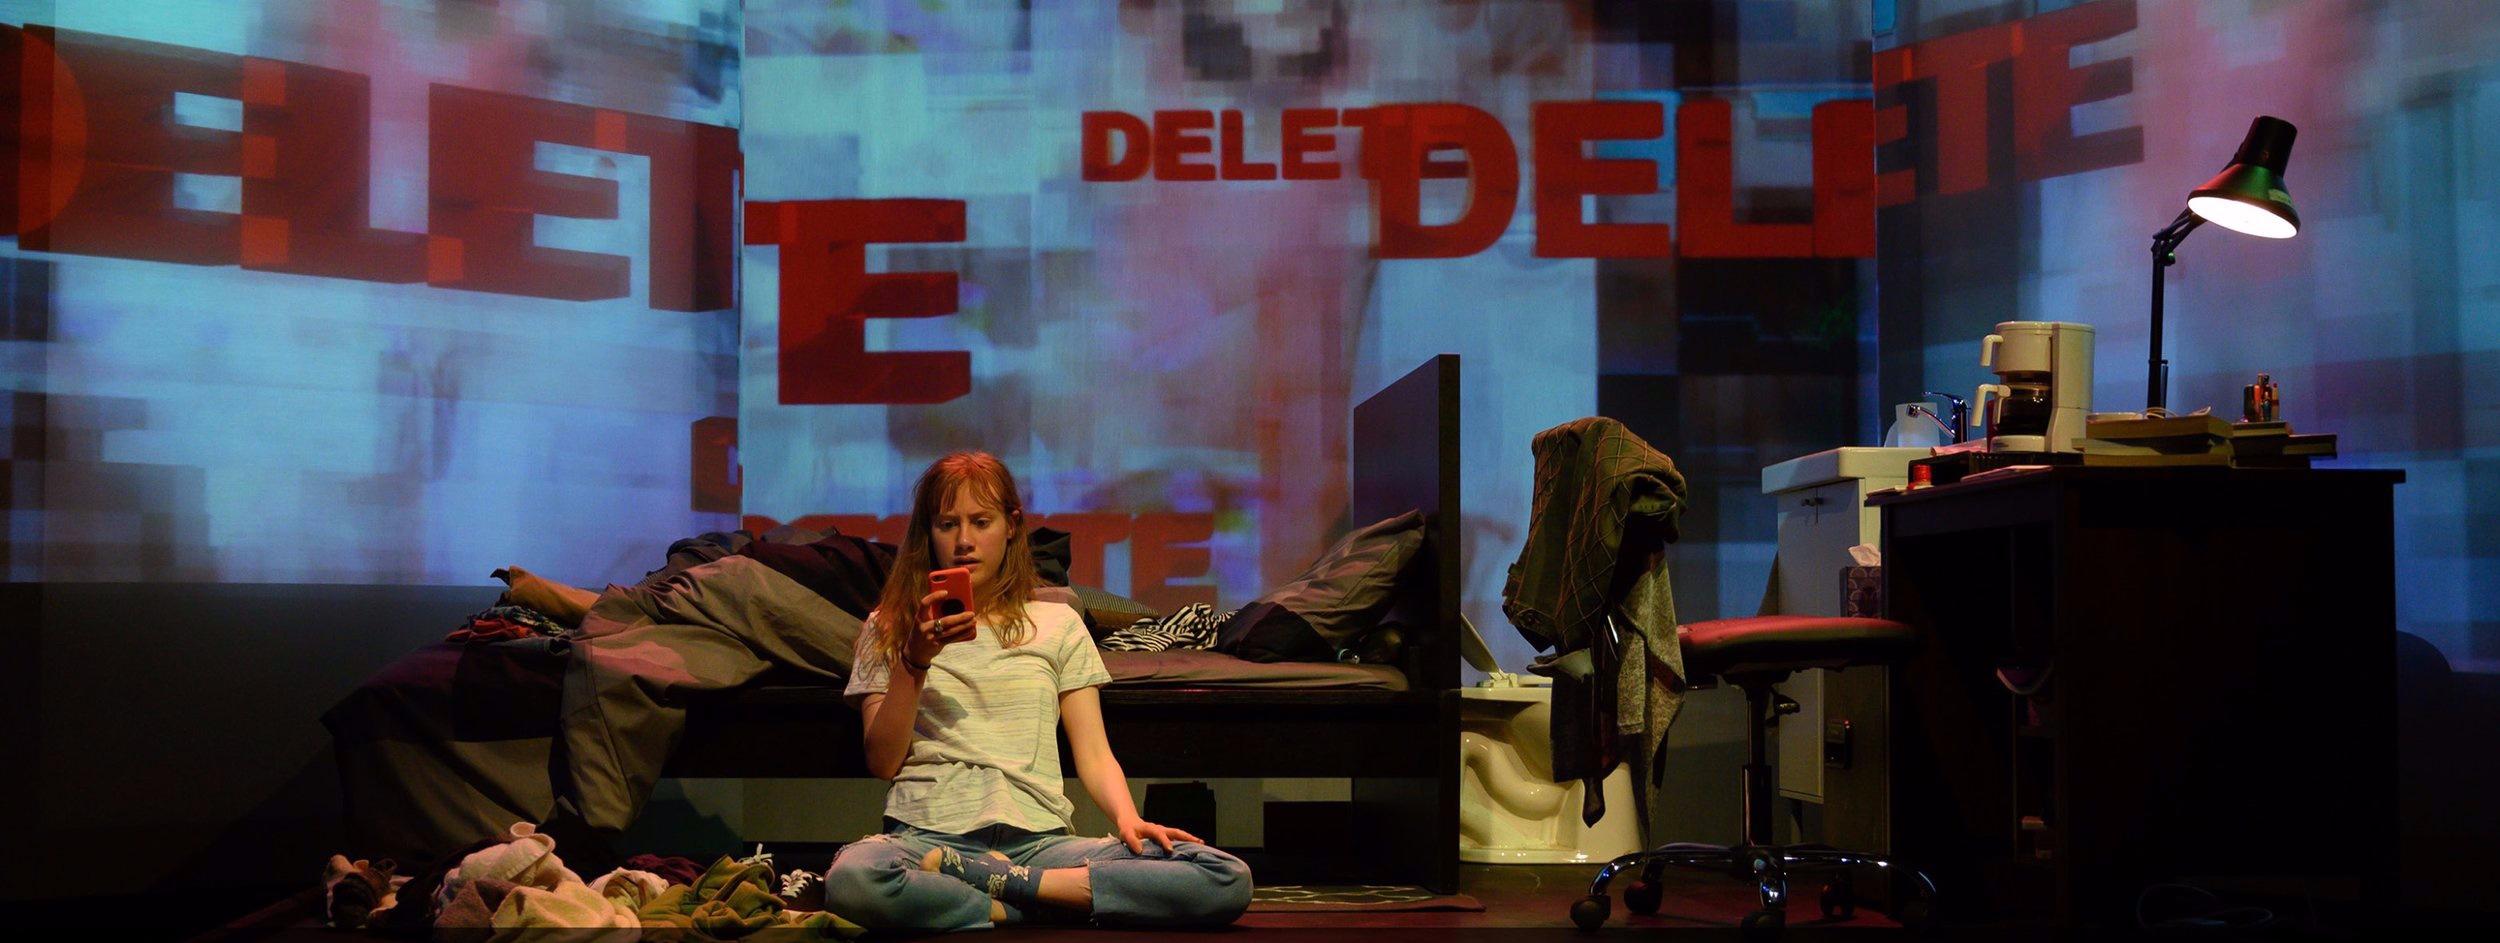 Alison in BOYCOTT ESTHER; Photo by Johanna Austin/AustinArt.org